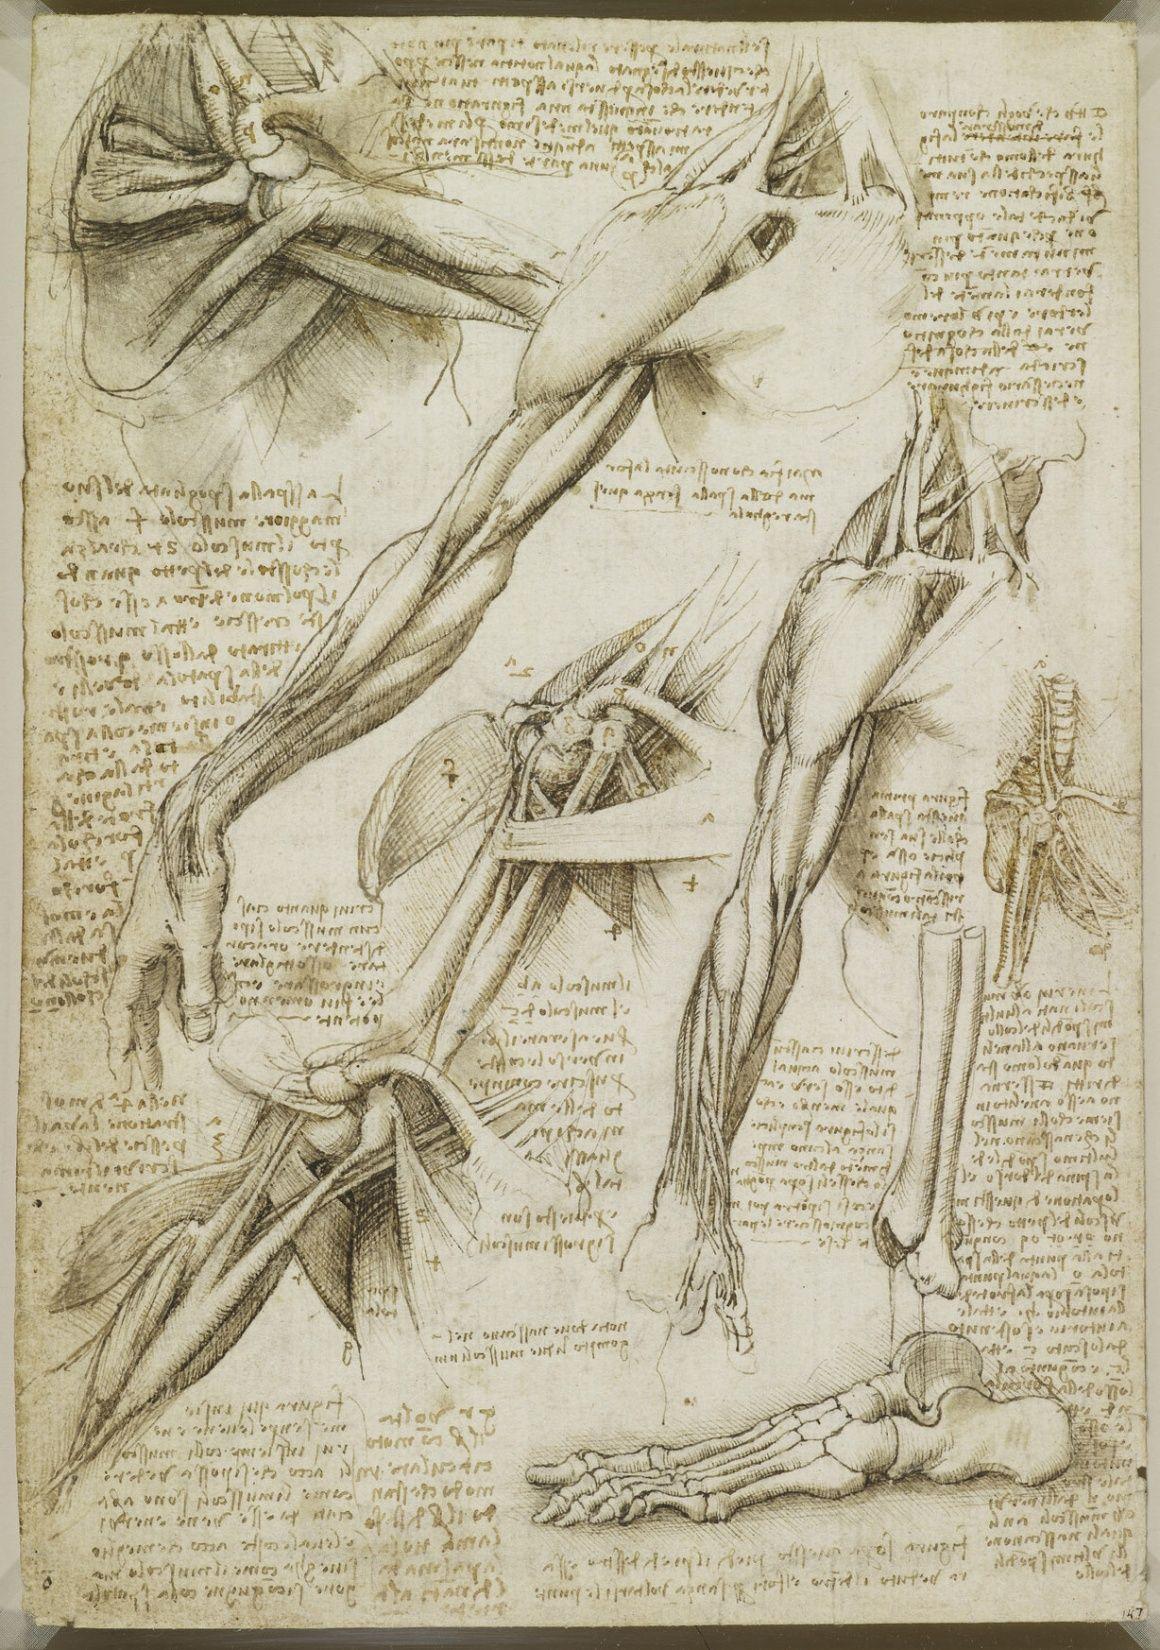 leonardo da vinci disegni - anatomia | Studi di anatomia | Pinterest ...